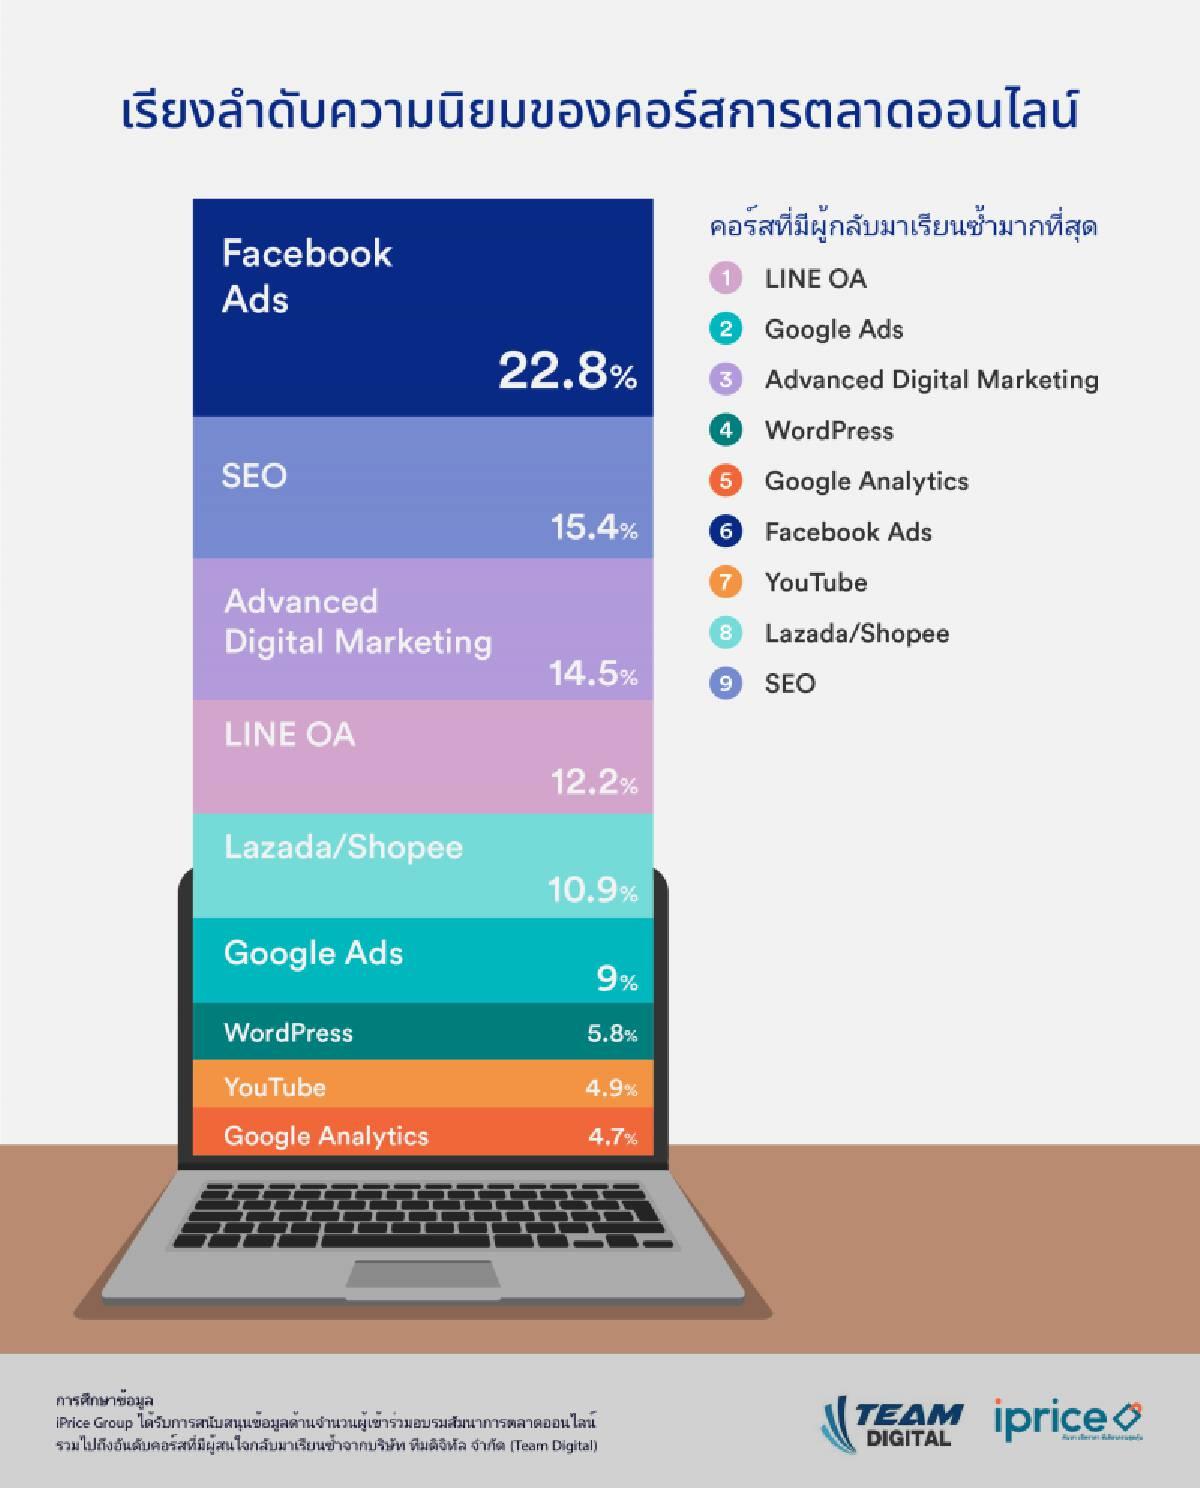 iPrice ร่วมกับ Team Digital เผย Facebook Ads คือเทรนด์การตลาดมาแรงที่อาจช่วยคุณกู้ภัย Covid-19 ได้